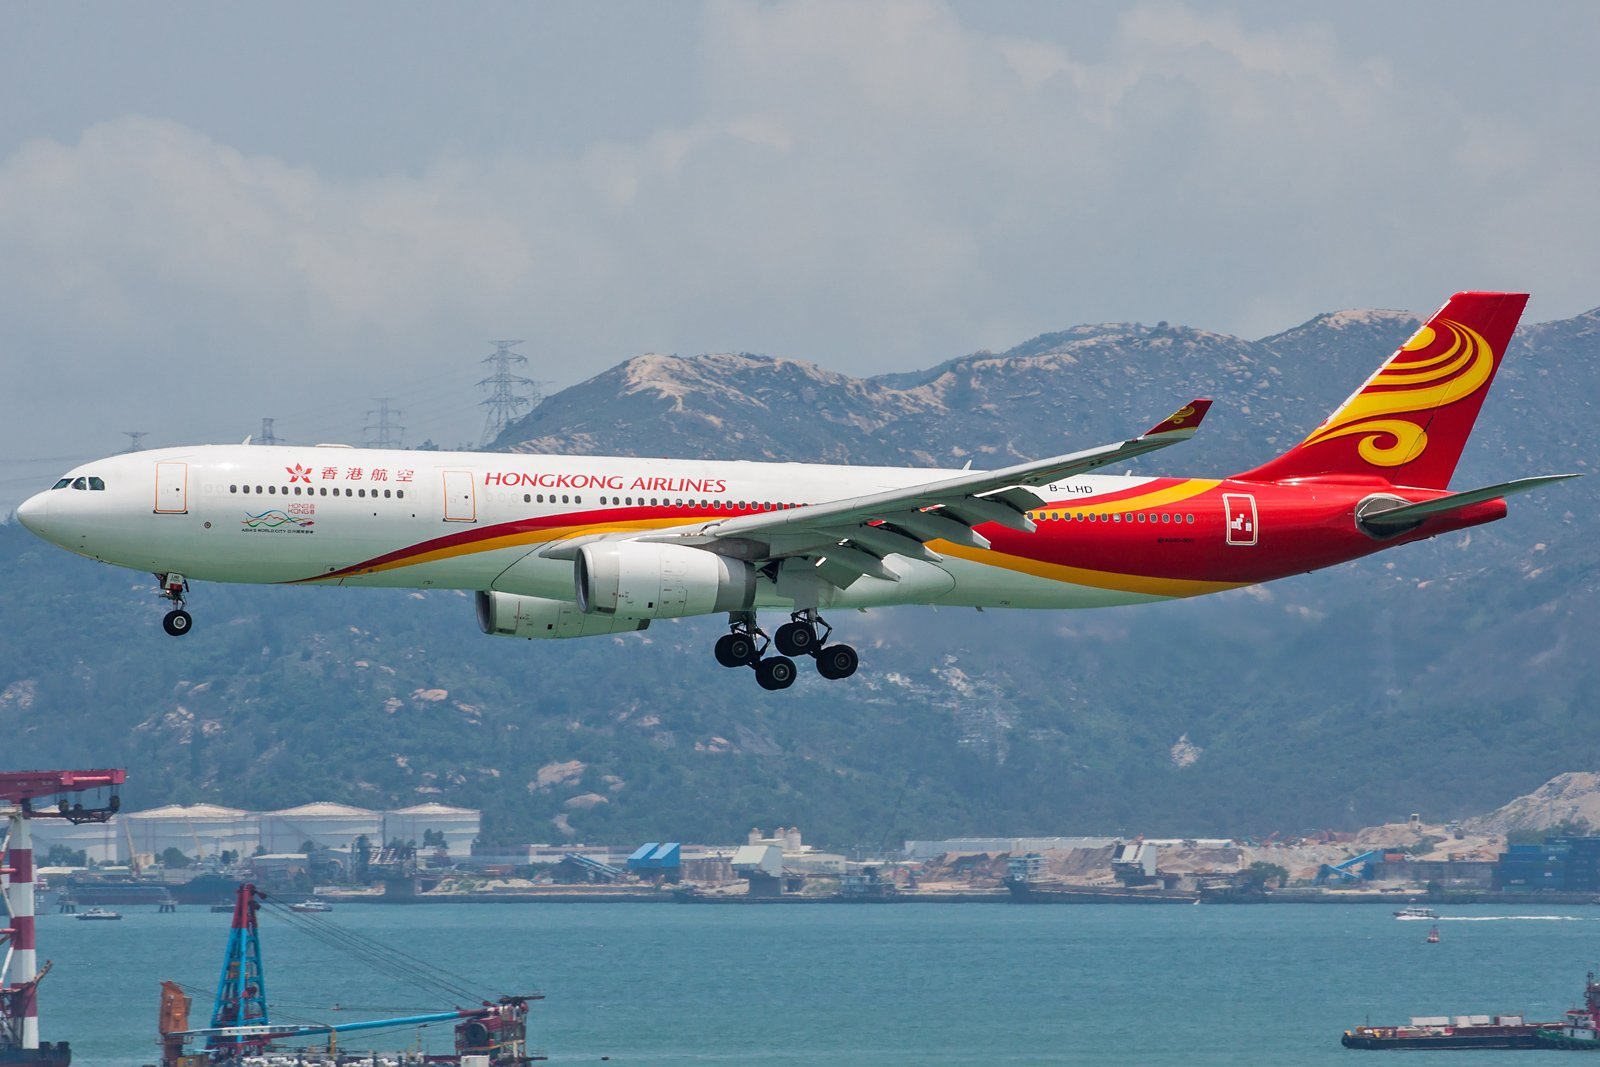 Hong Kong Airlines Airbus A330-343 B-LHD